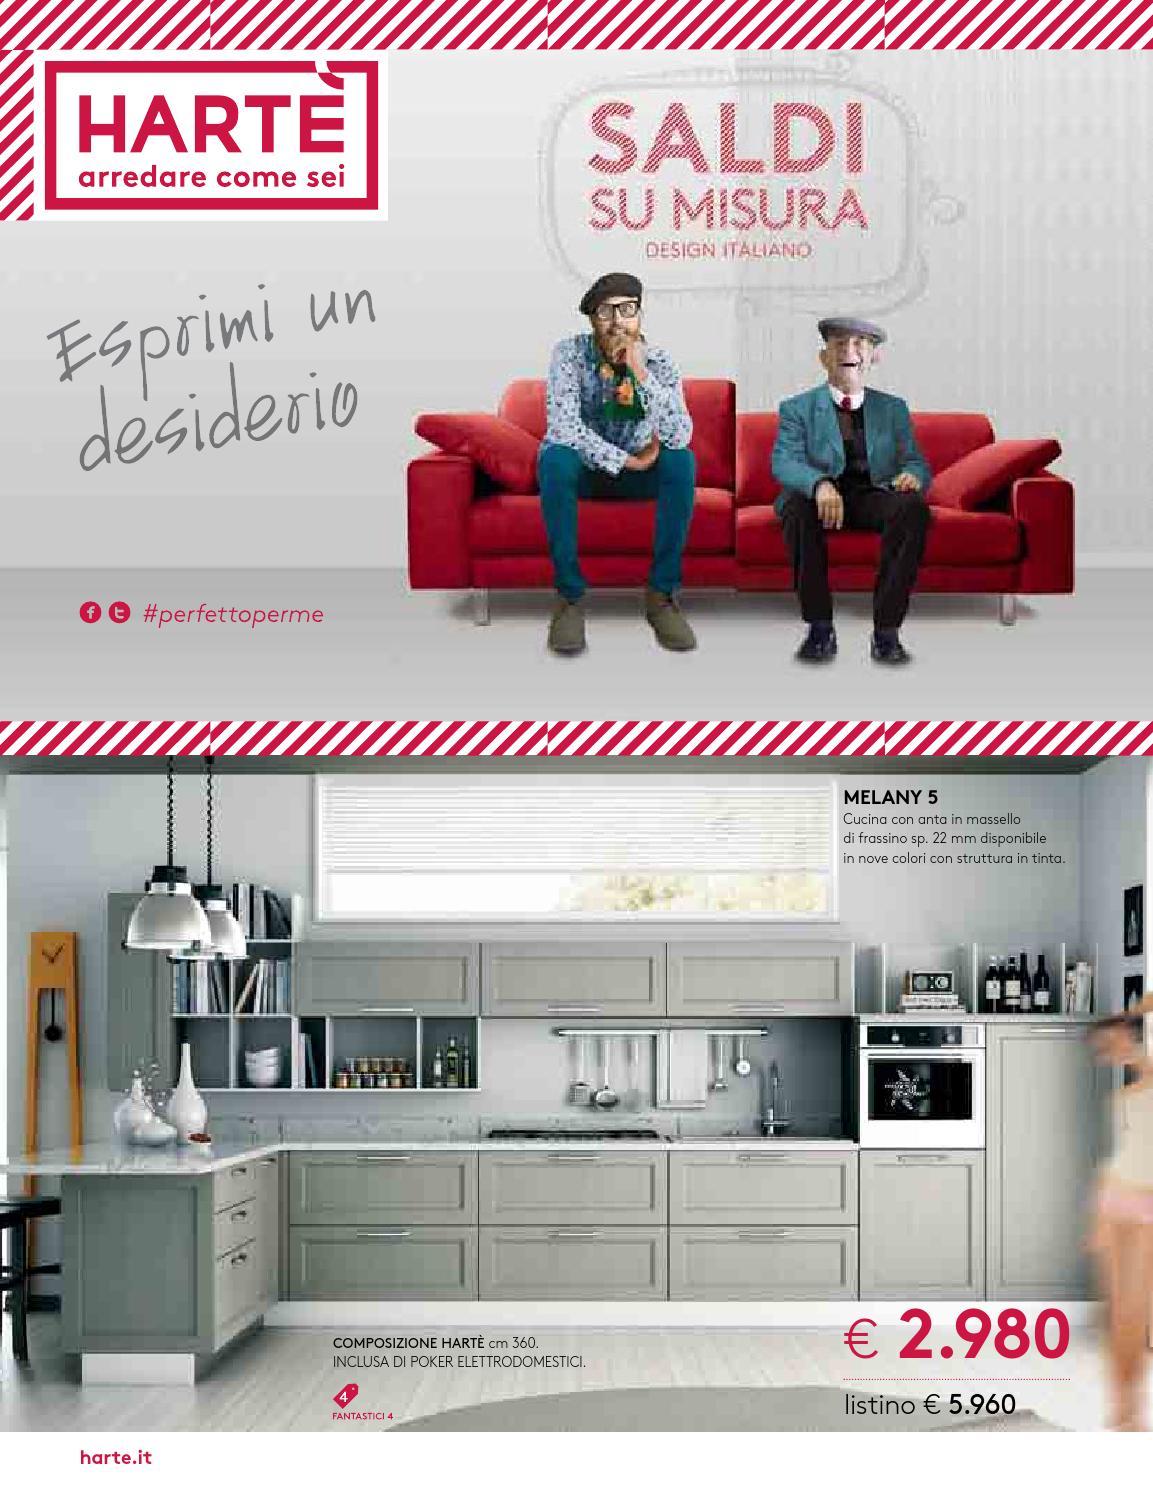 Harte saldi 2015 by mobilpro issuu for Rossino arredamenti